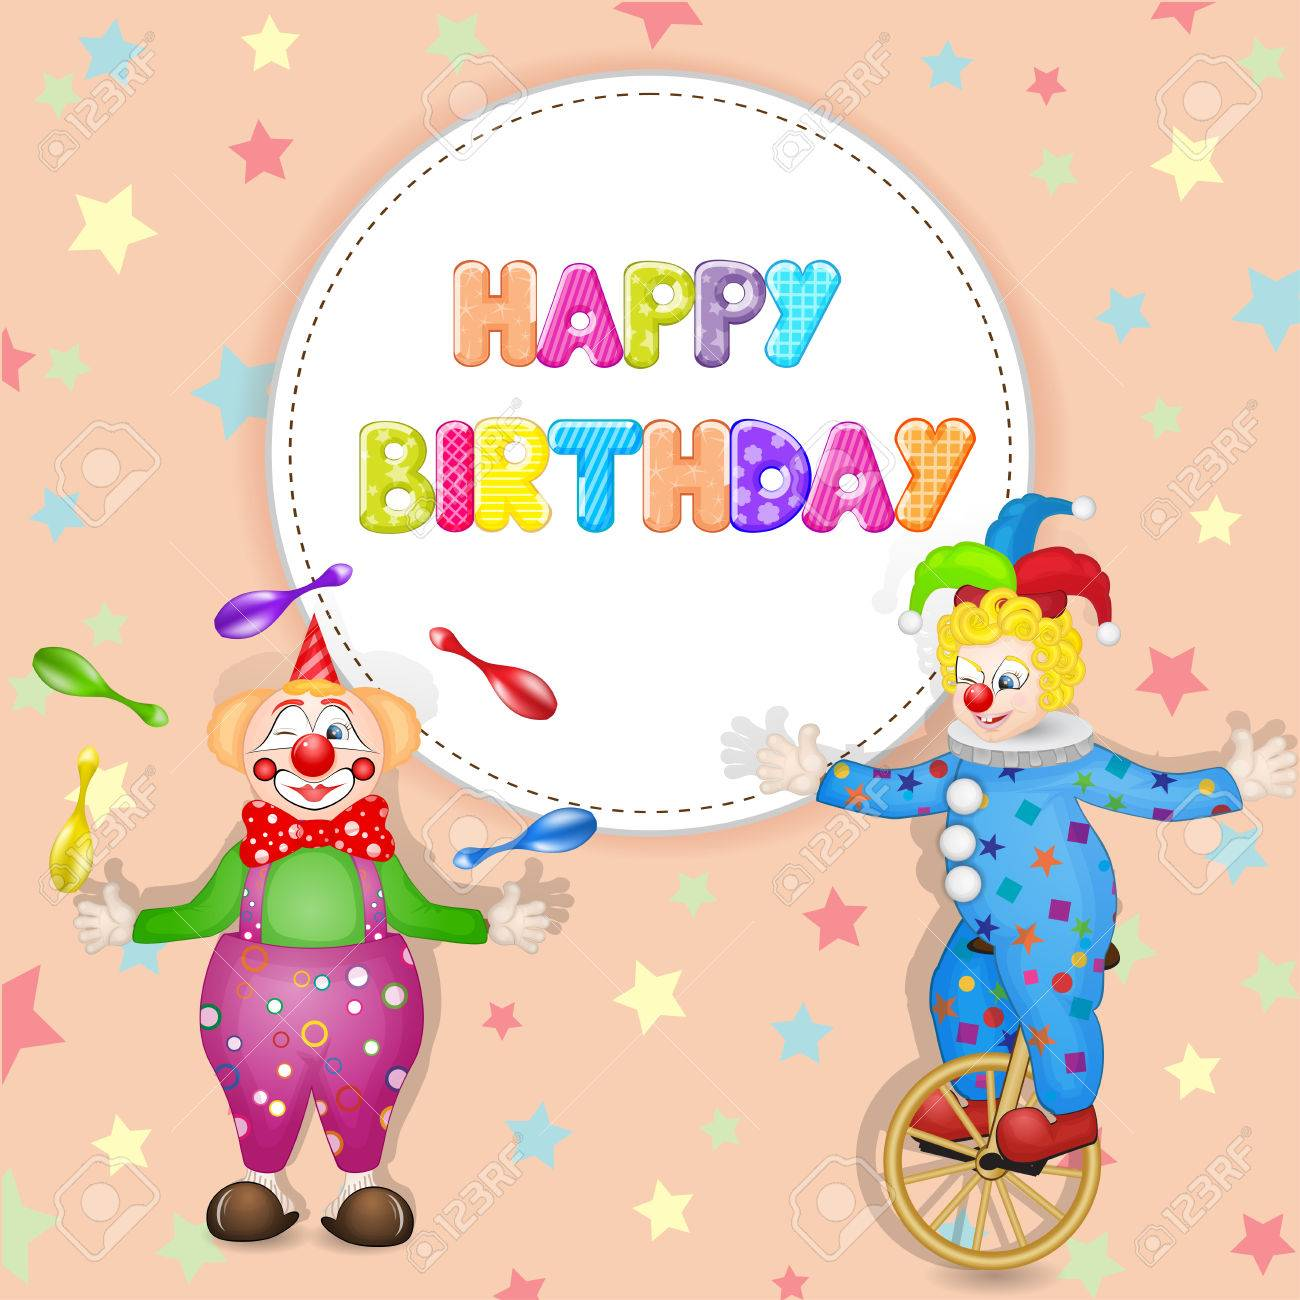 Happy birthday greetings cute happy birthday card with fun clowns happy birthday greetings cute happy birthday card with fun clowns stock photo 51656211 kristyandbryce Images